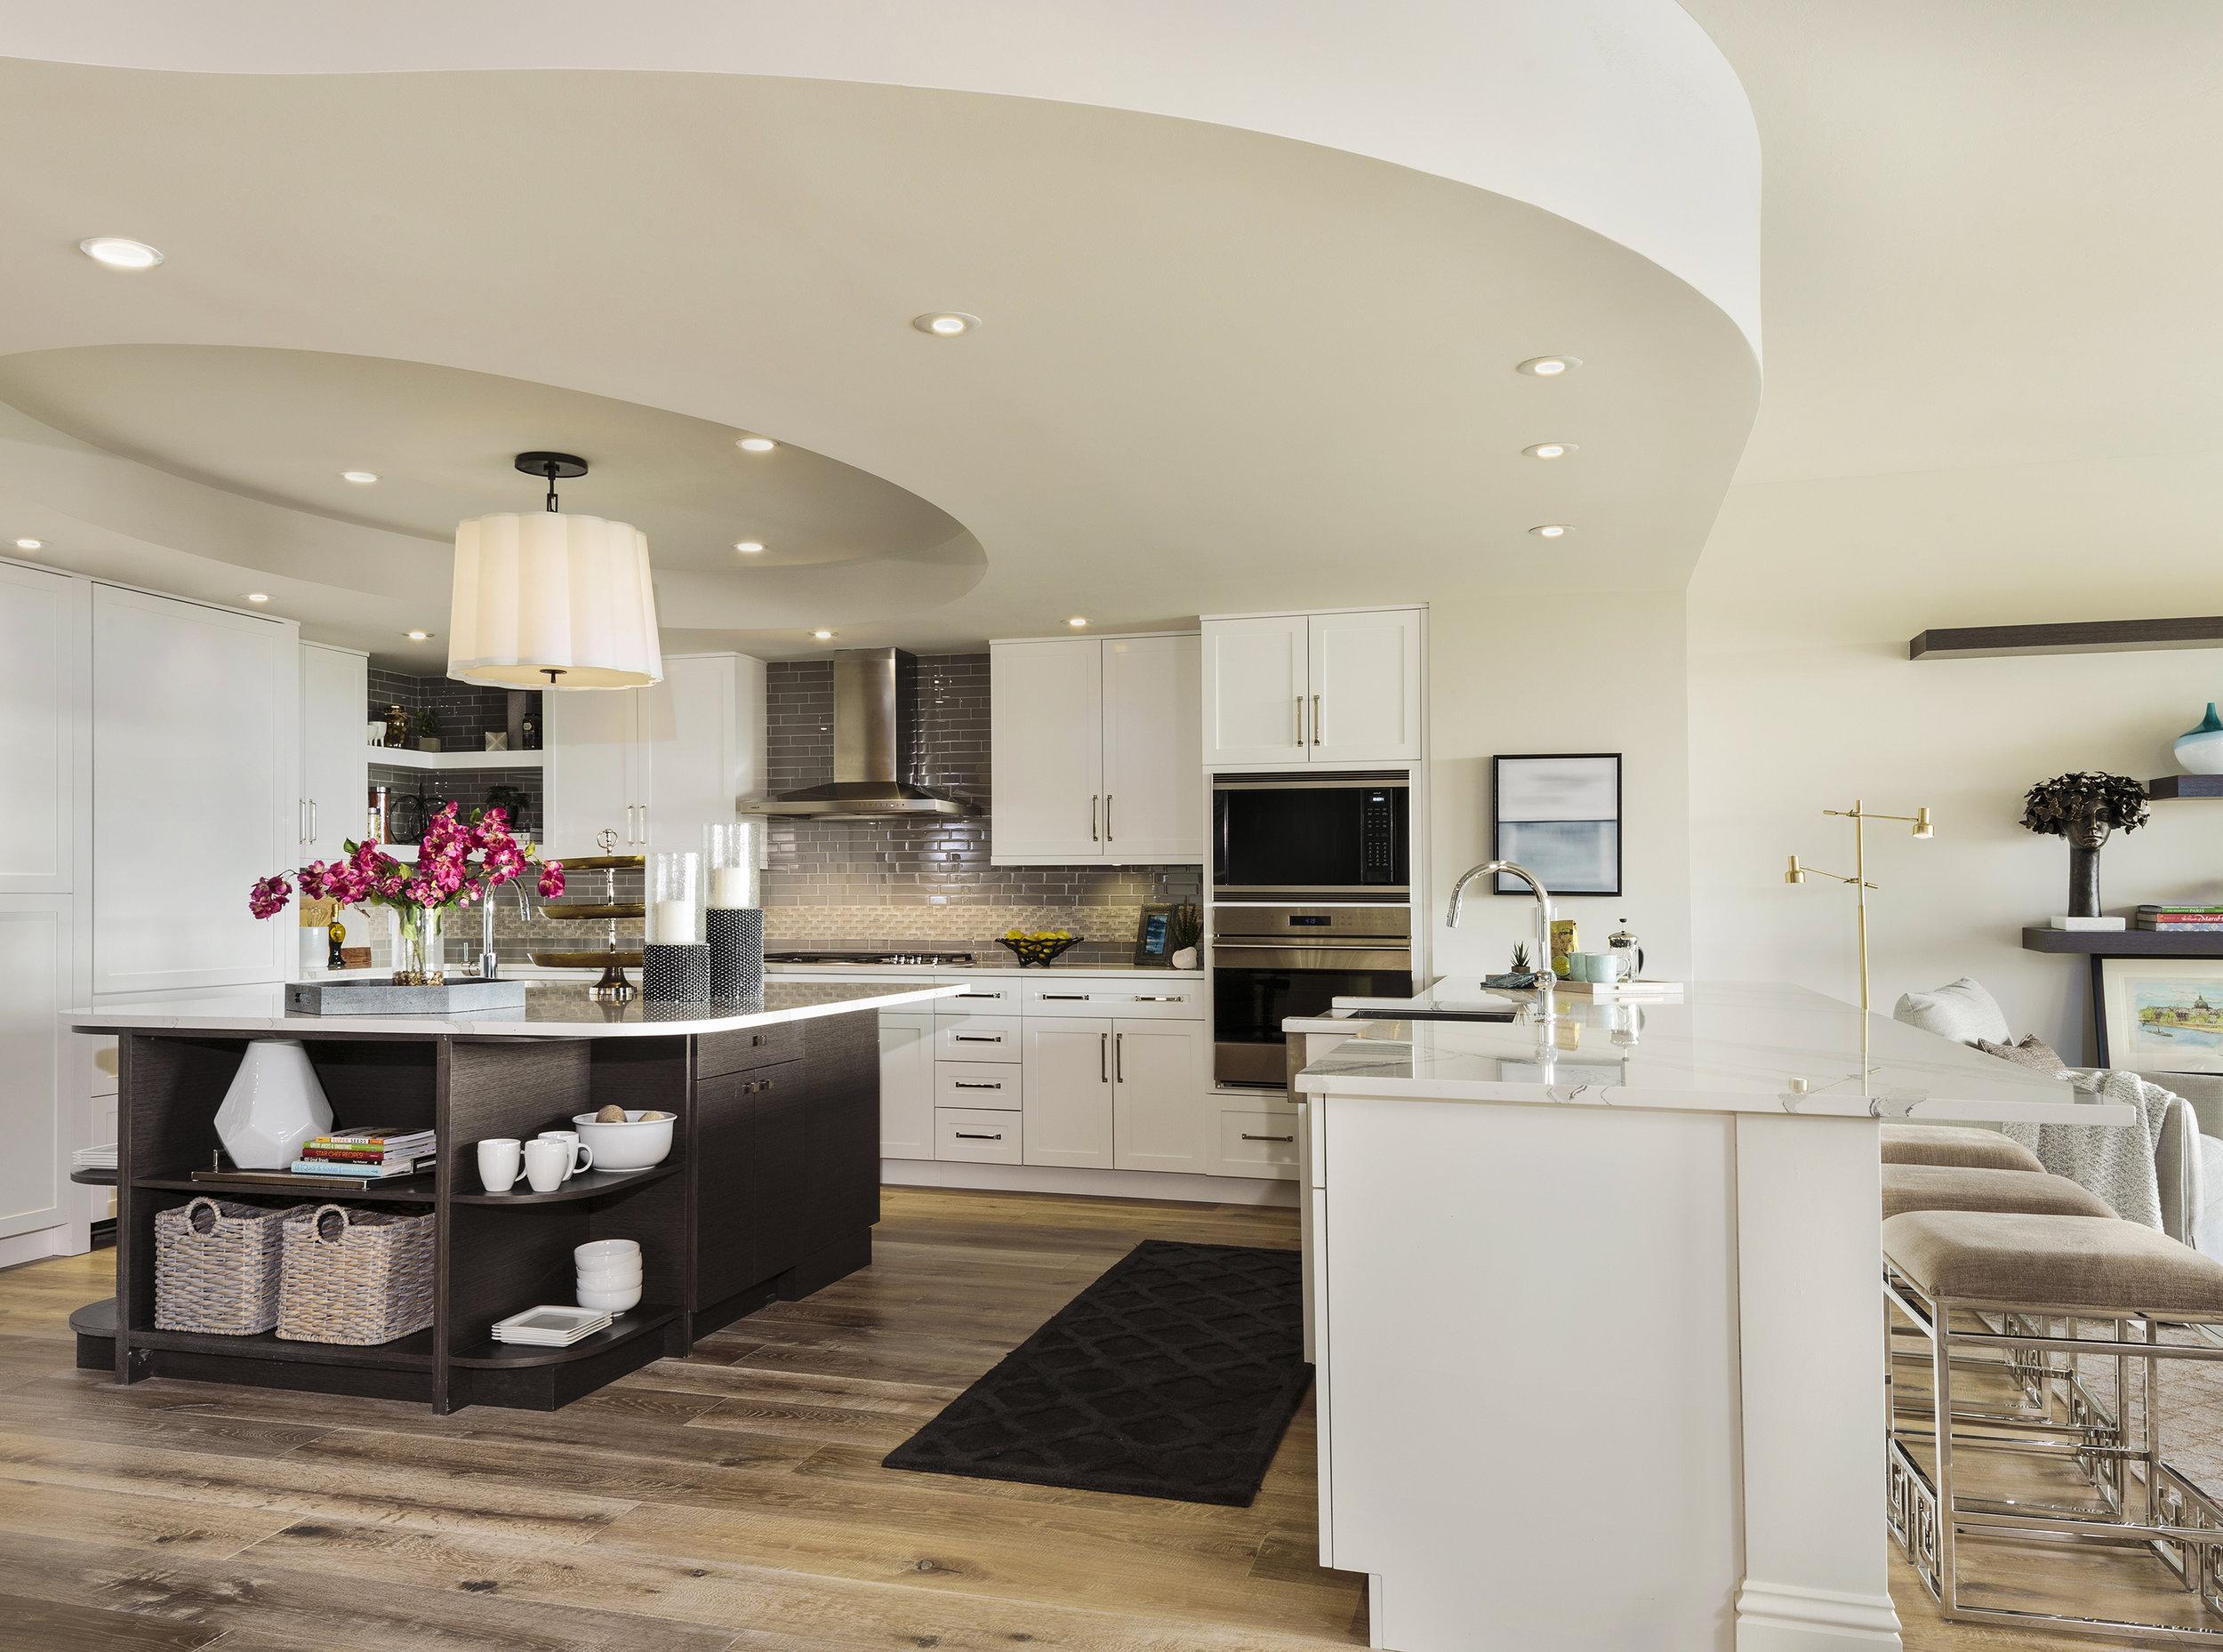 kitchen side 1 AQUA at Pelican Bay Condo 304 Design In Naples By Beasley & Henley Interior Design.jpg